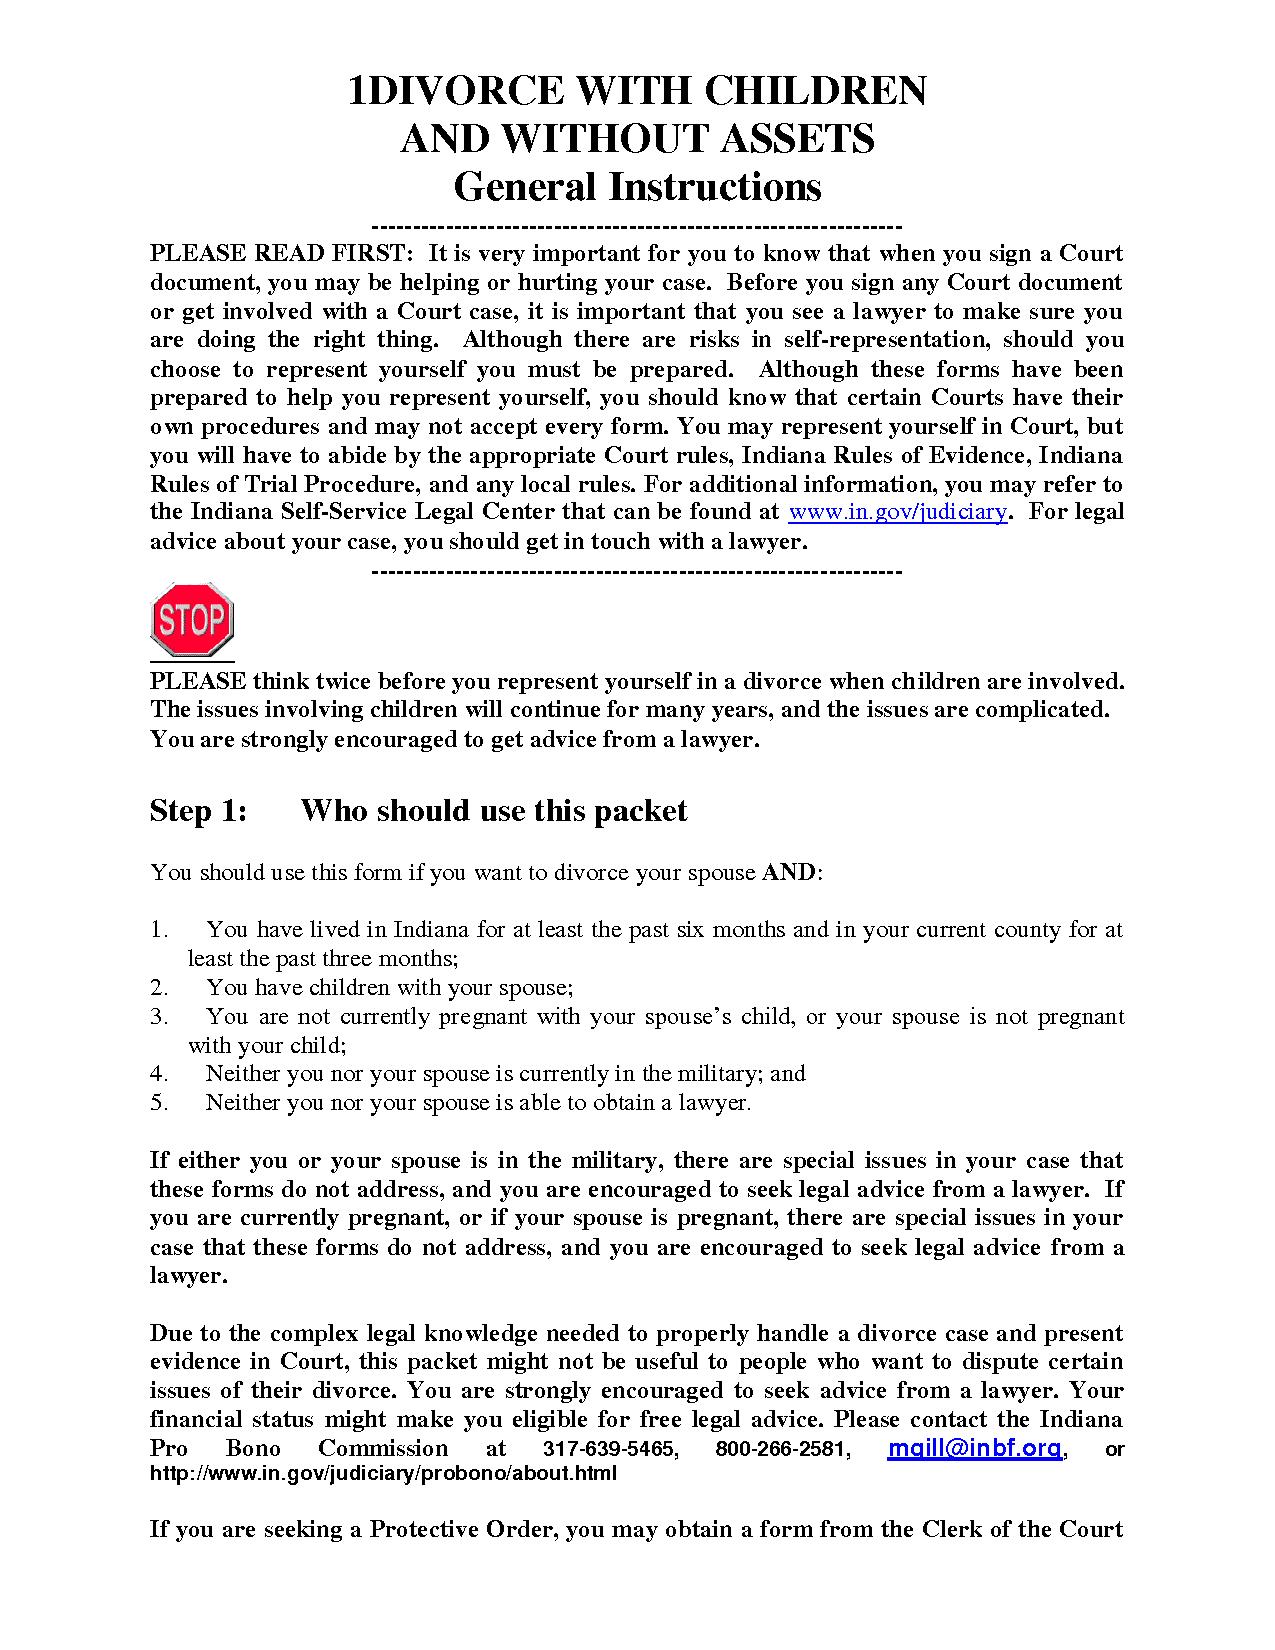 Free Printable Divorce Documents Form (Generic) Forms Papers Pics - Free Printable Documents